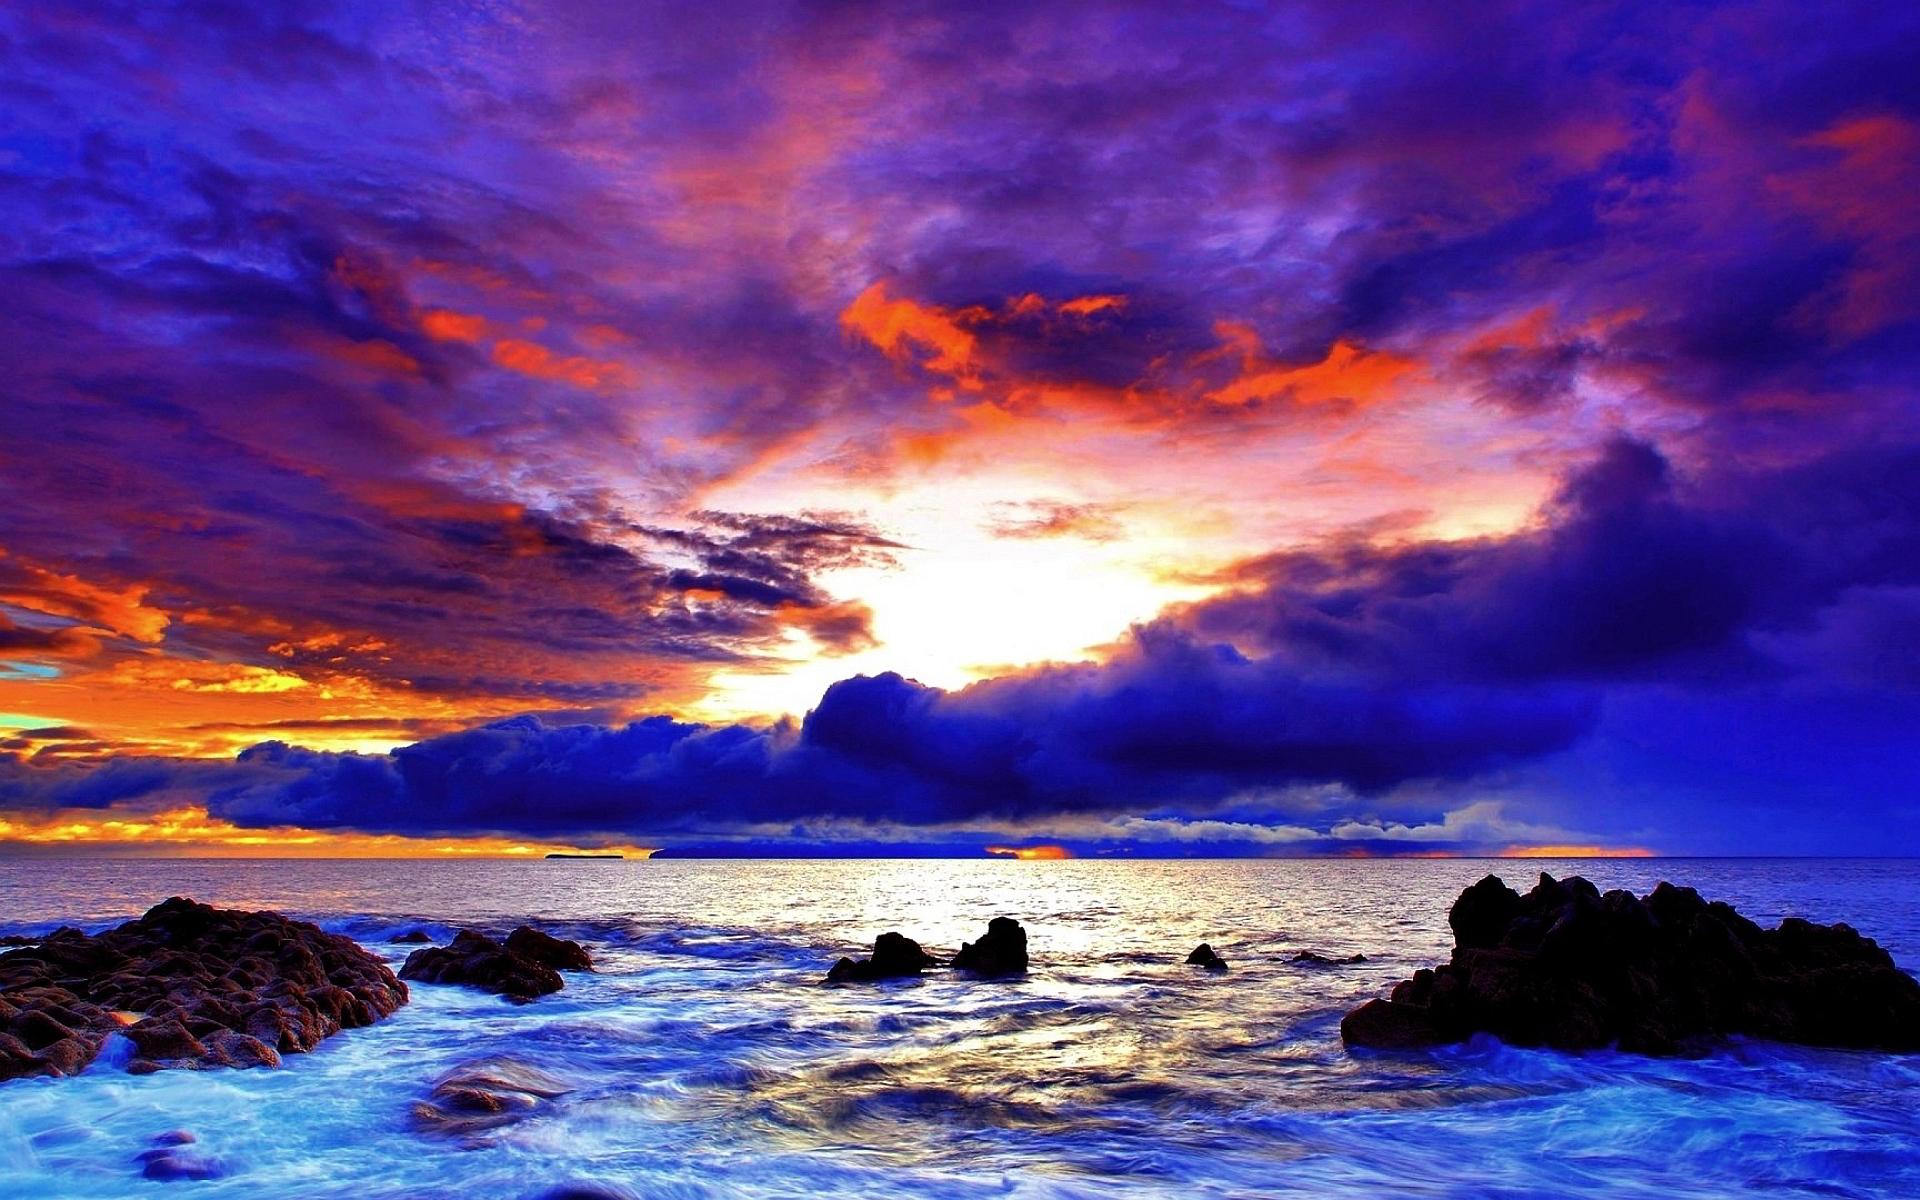 sunset images purple beach  HD Desktop Wallpapers  4k HD